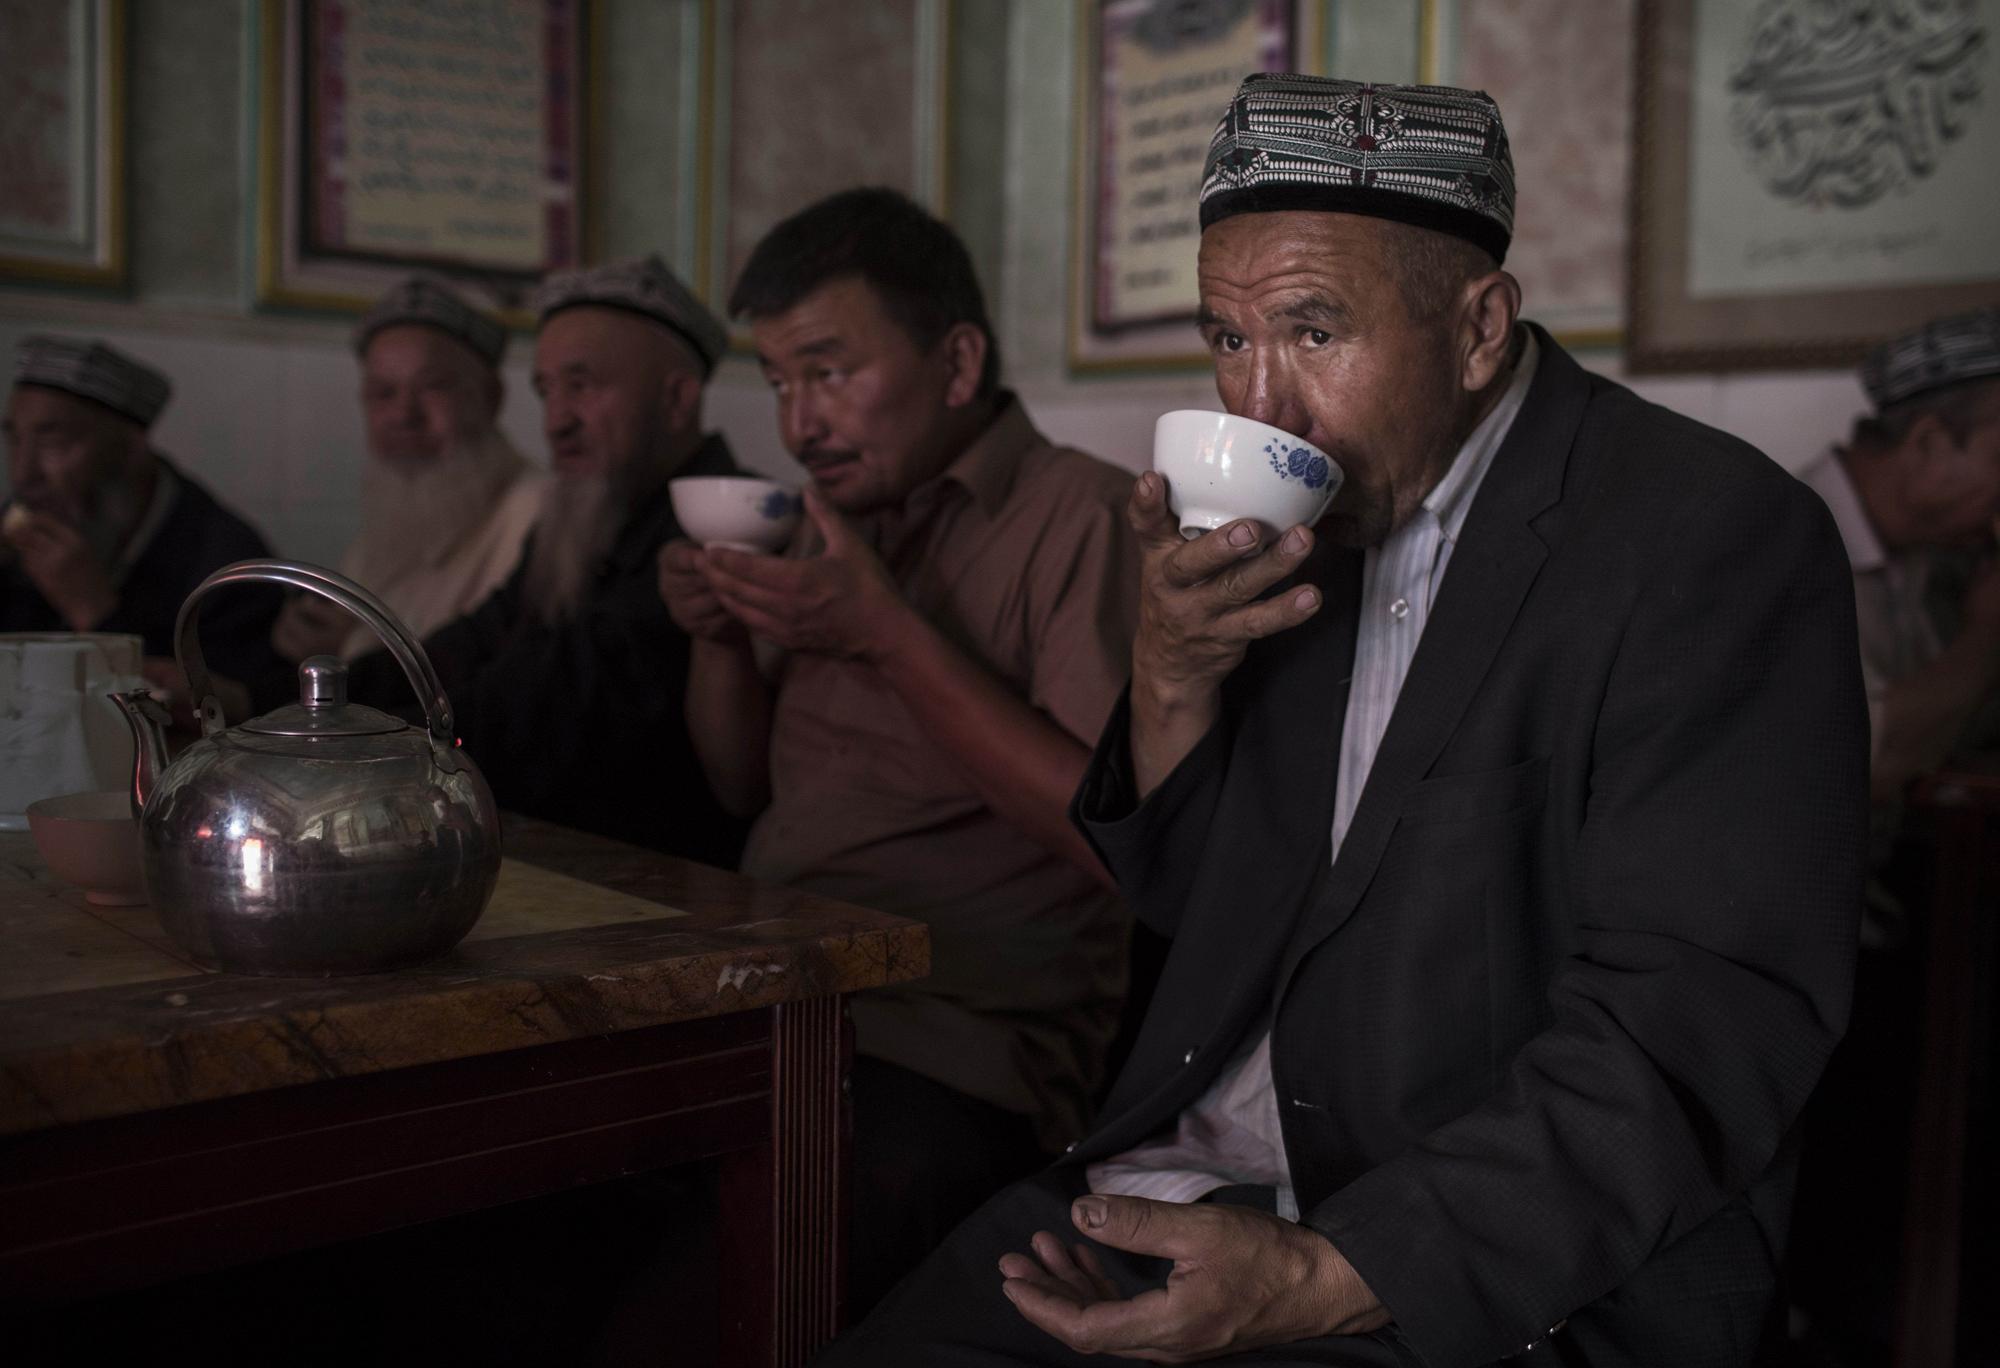 A Uighur man drinks tea at a restaurant on August 1, 2014 in old Kashgar.